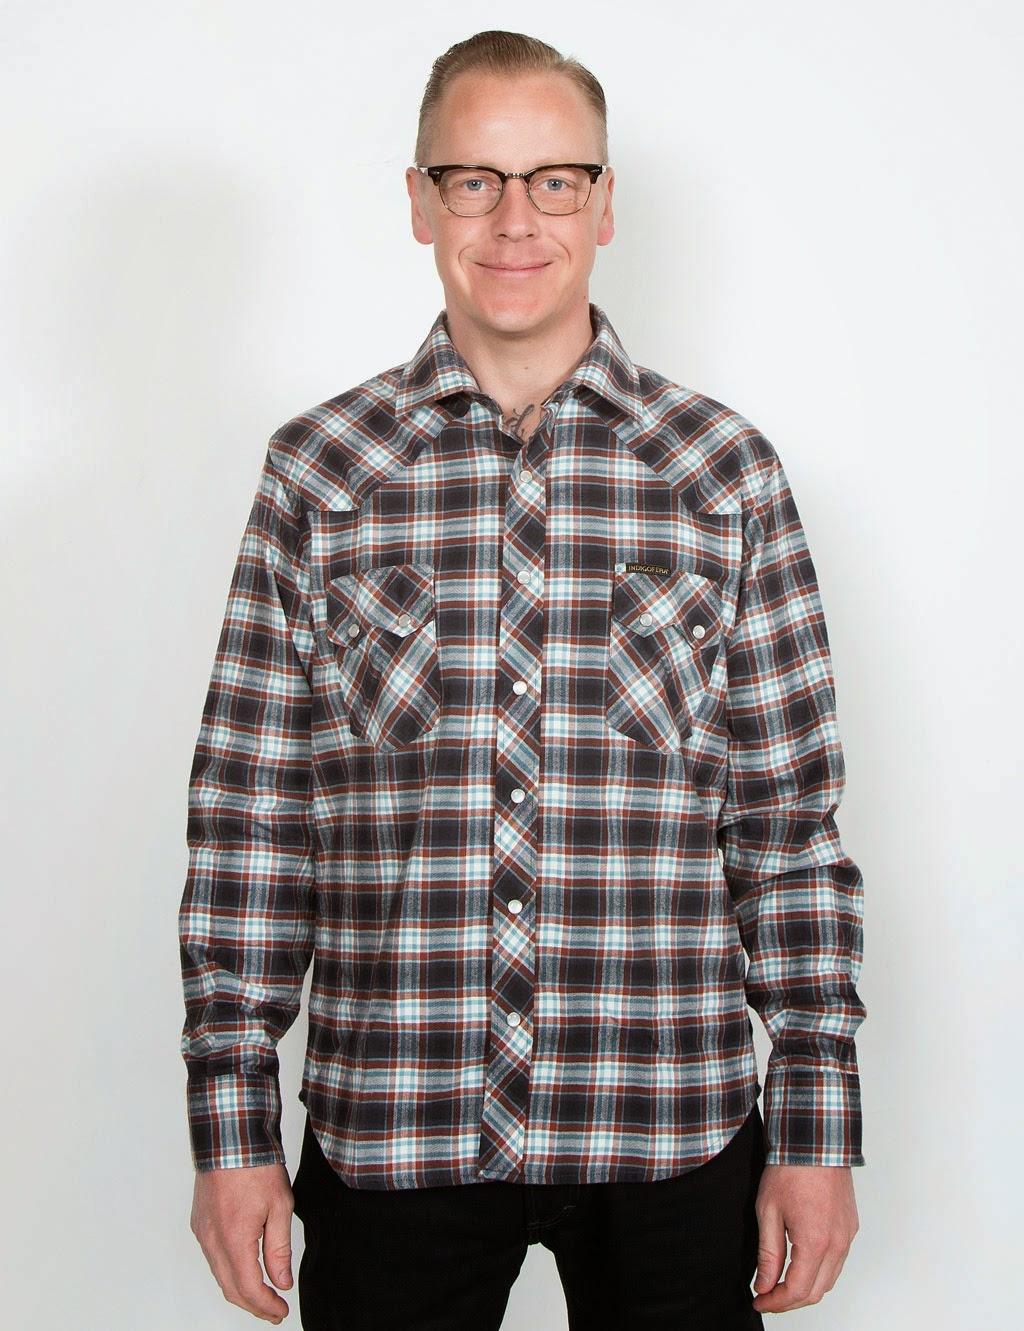 http://www.hepcat.se/departments/indigofera-dollard-shirt-checked-navyred